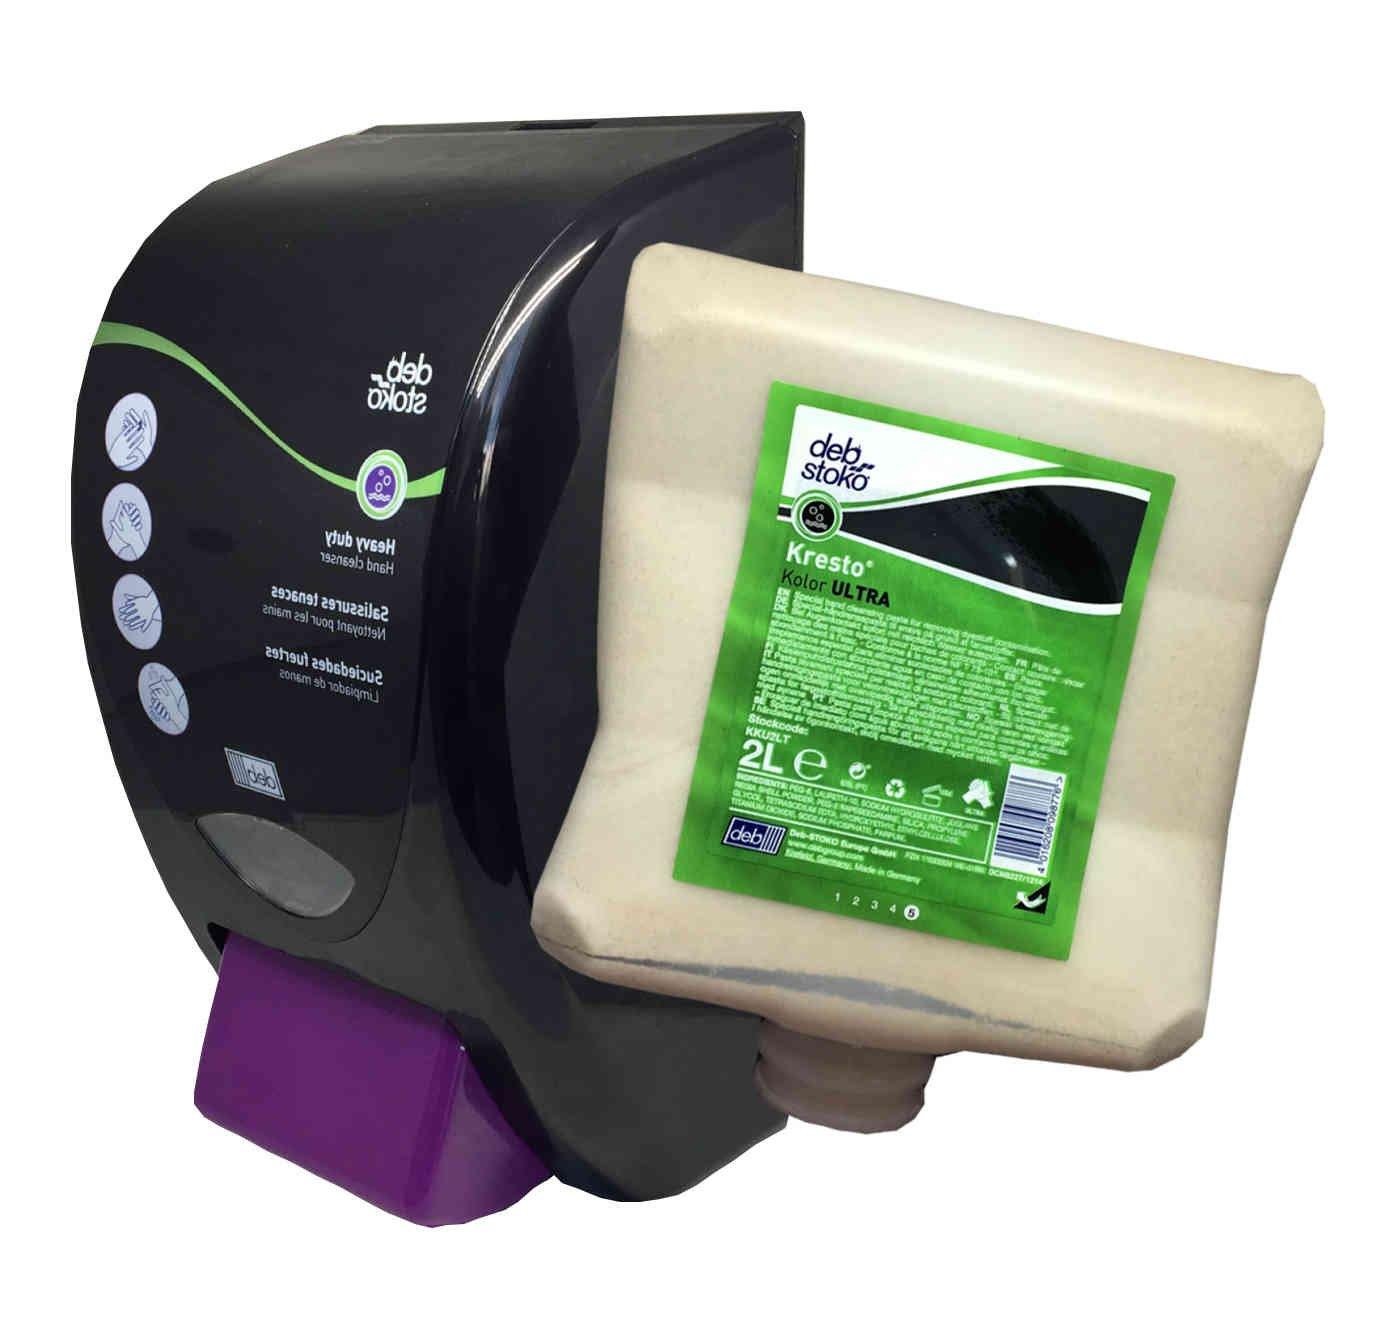 Kresto Kolor Ultra Specialist Hand Cleanser Paste 2 Liter Bottle (KKU2LT) + Dispenser (HVY2LDB) Combo